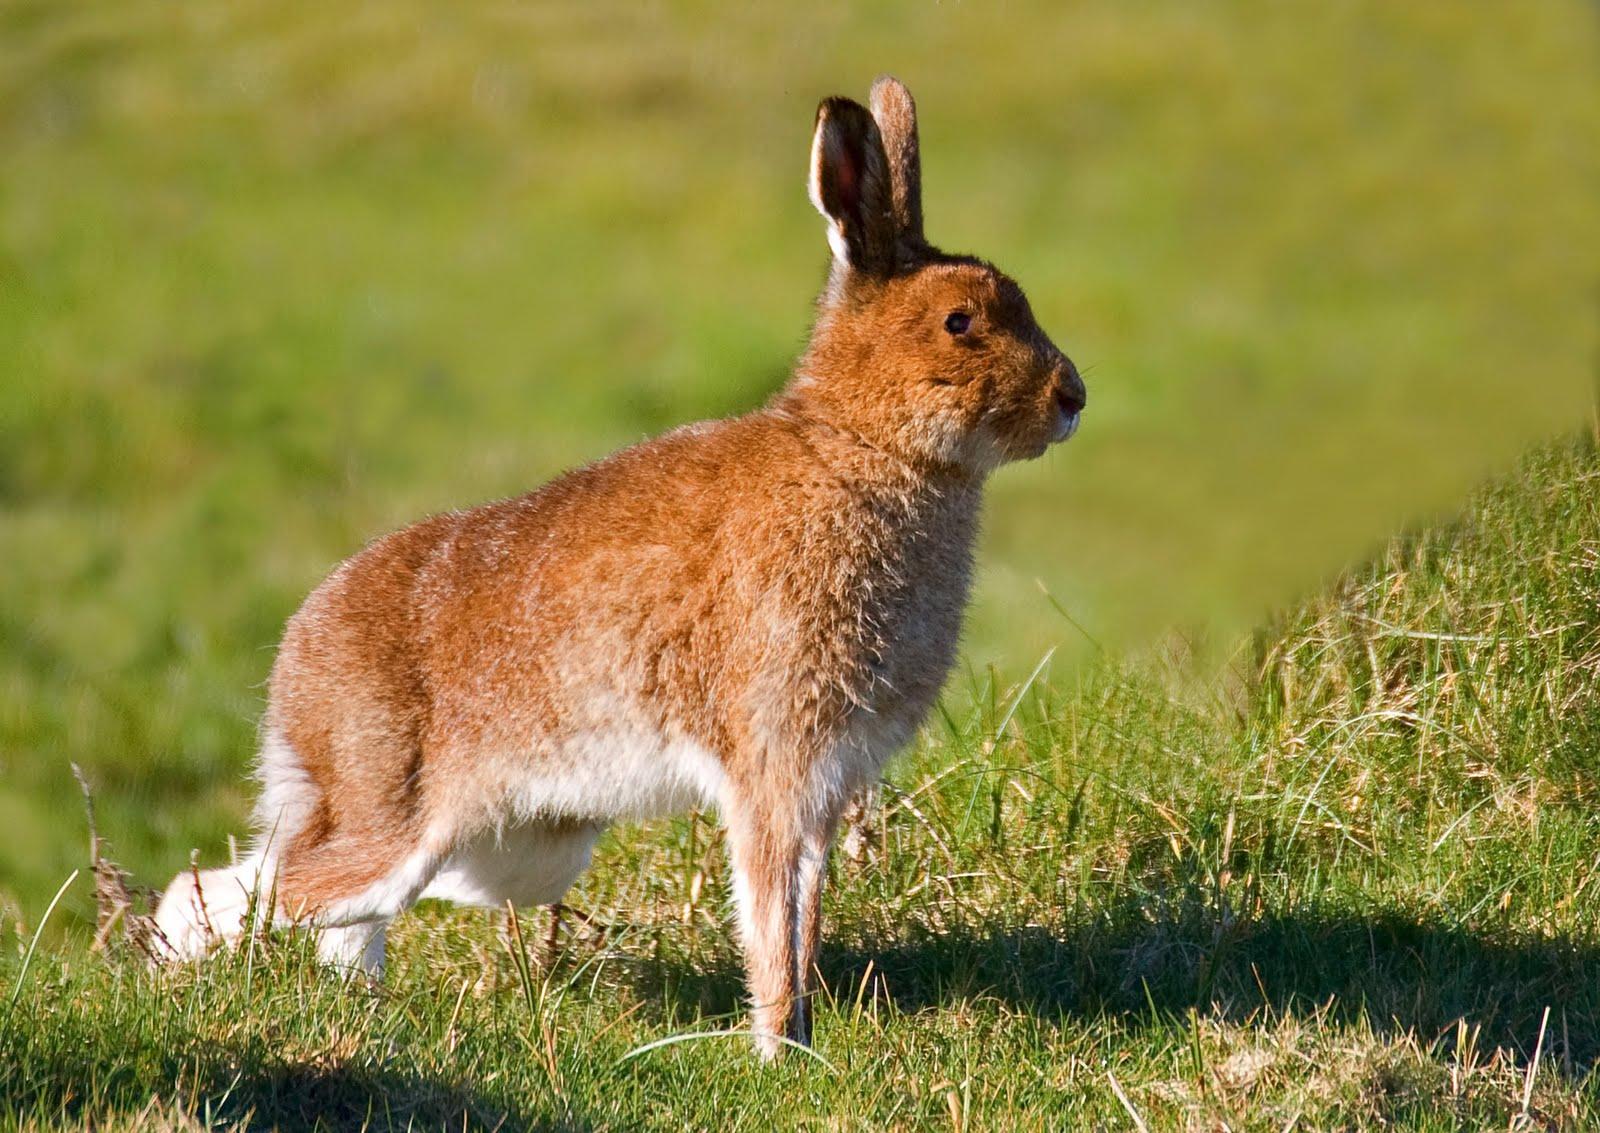 Irish Hare ( Lepus timidus hibernicus ): irishwildlifephotography.blogspot.com/2011/03/irish-hare.html